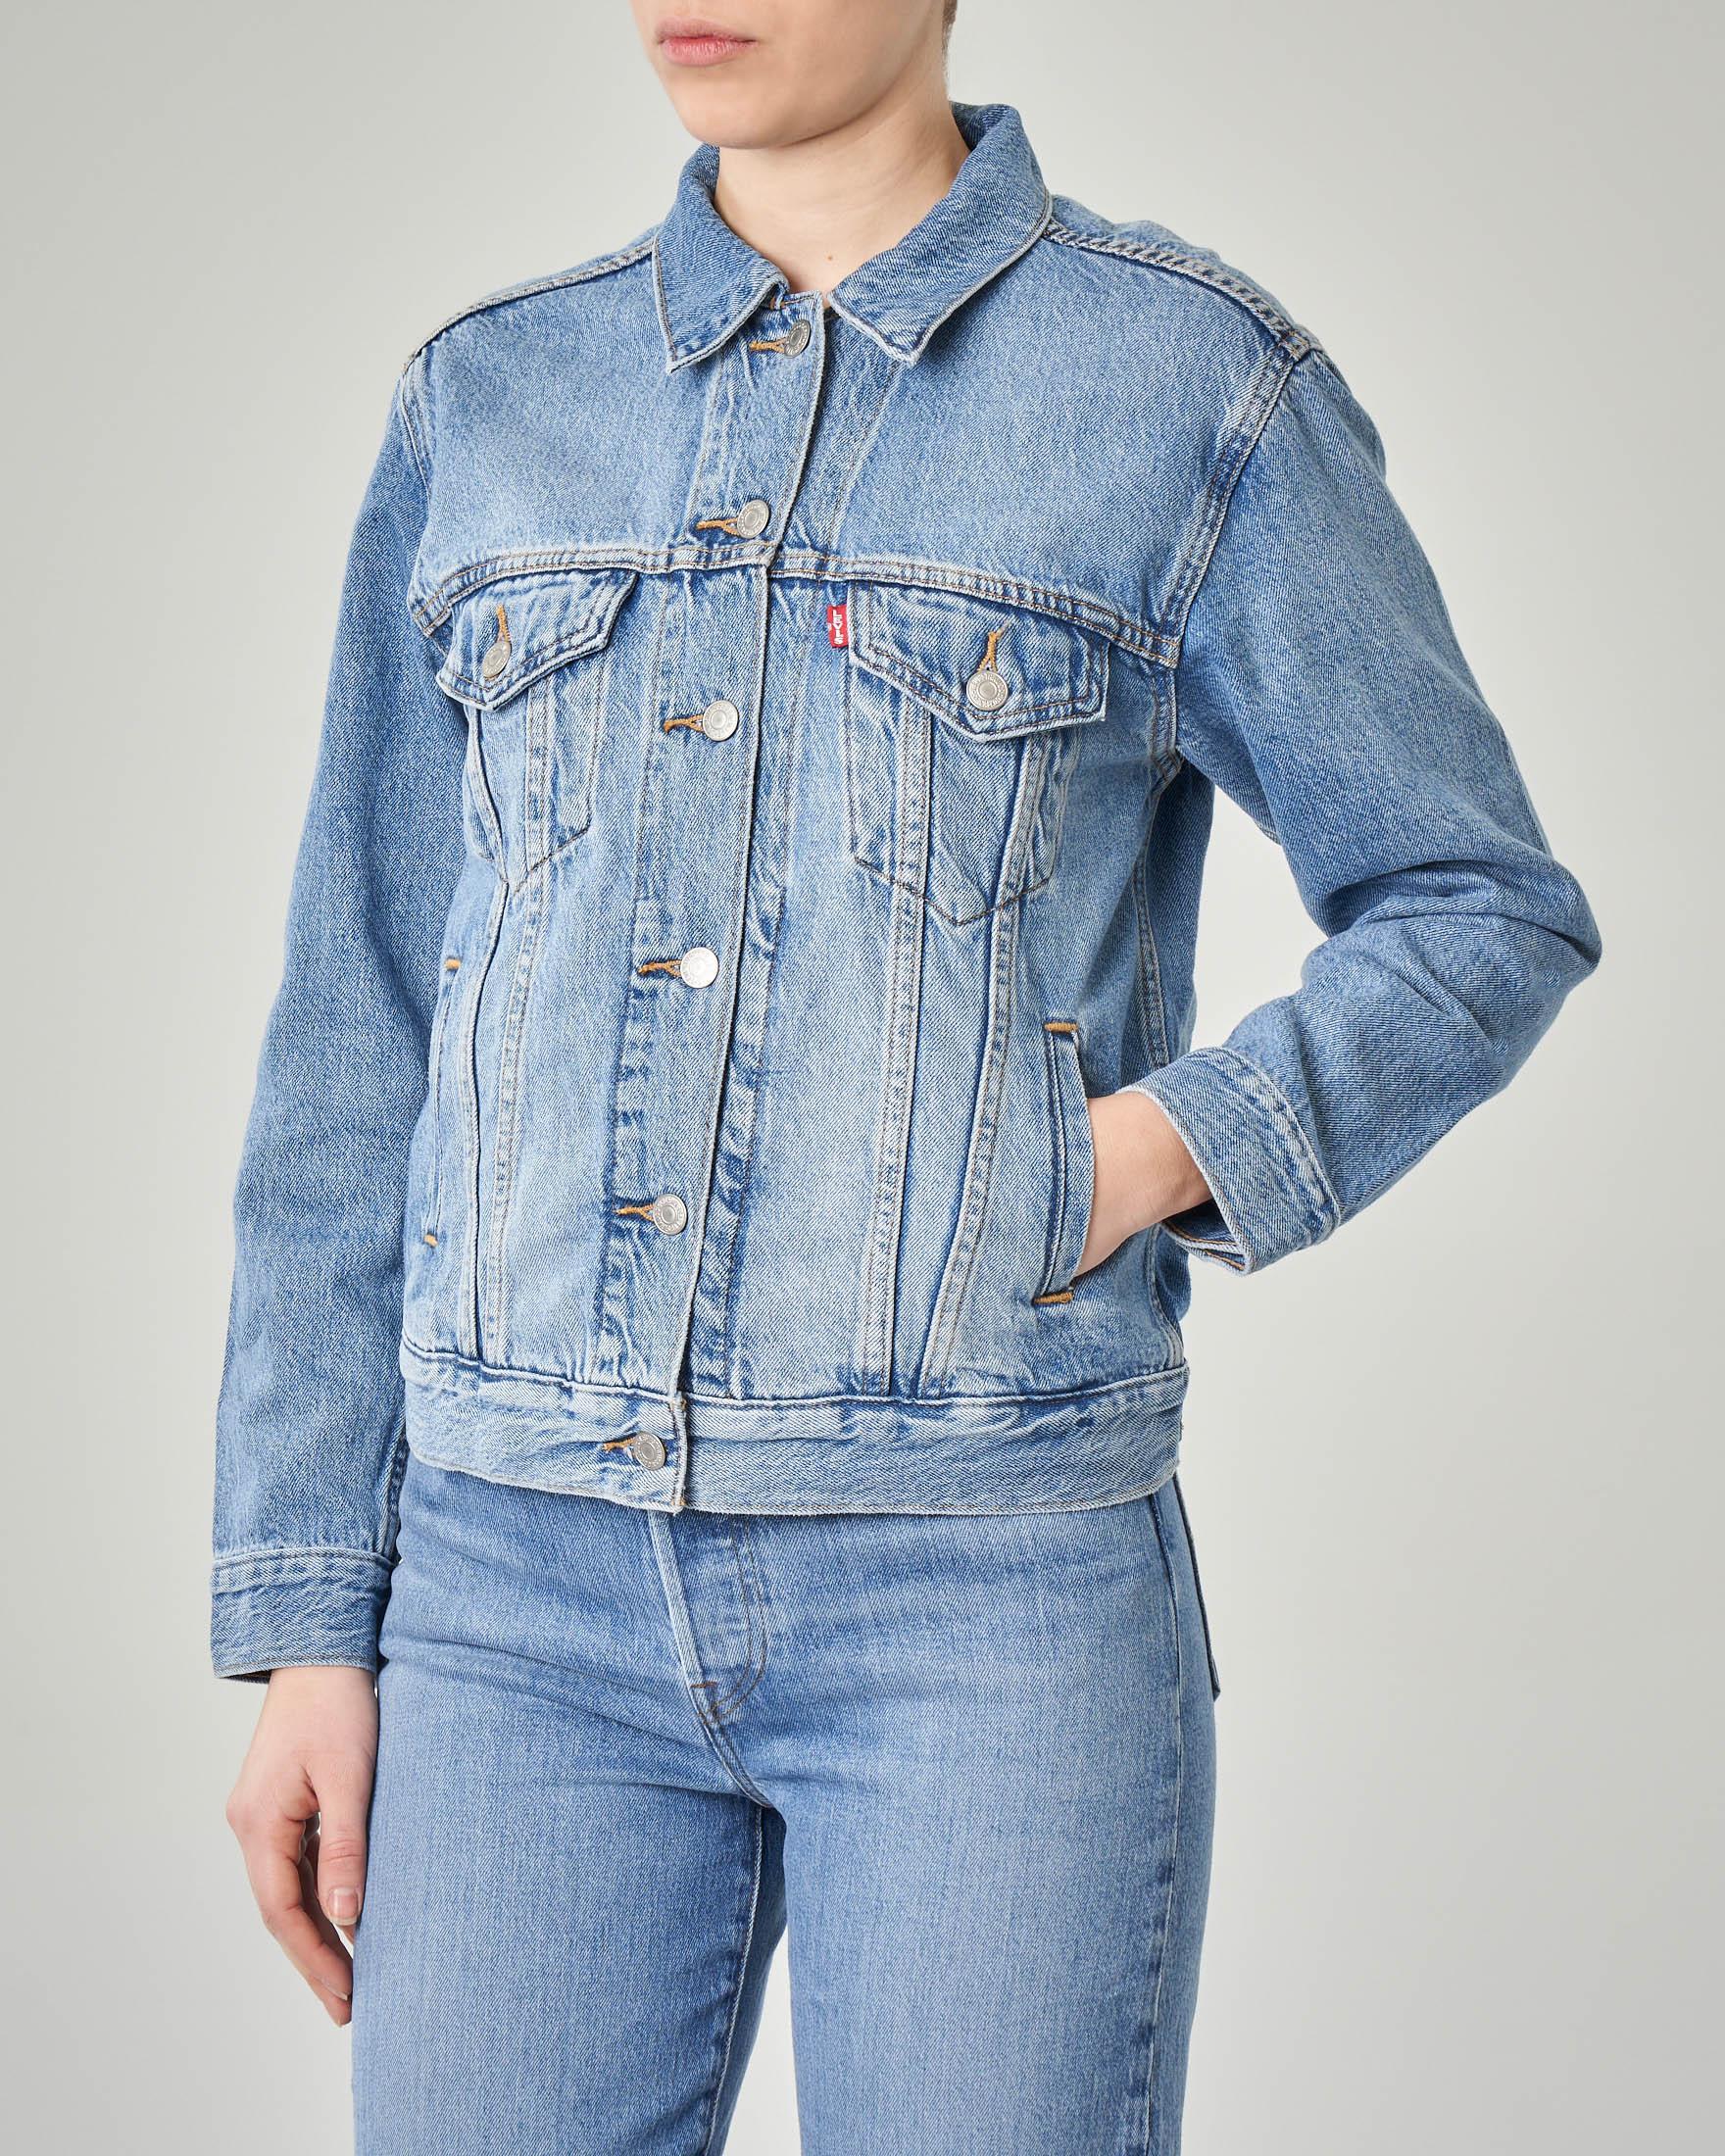 Giacca Trucker in jeans blu chiaro